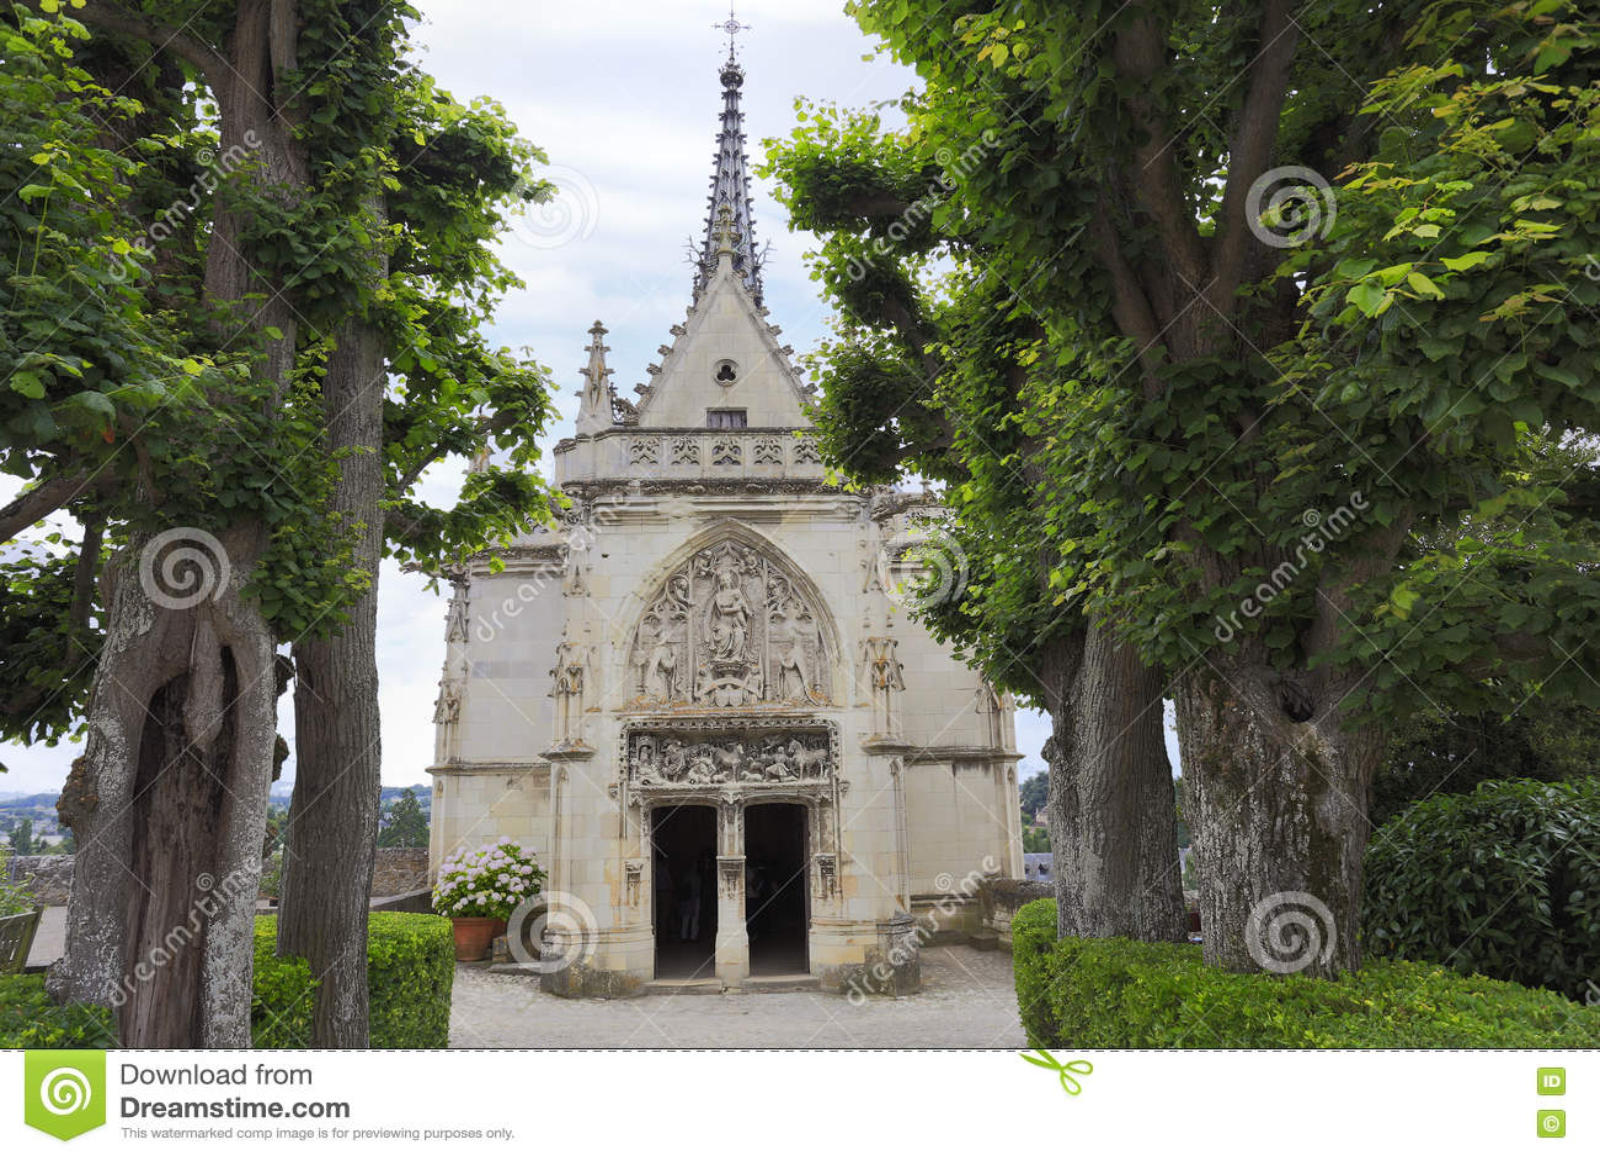 Amboise, Saint Hubert gothic chapel, Leonardo Da Vinci tomb in Loire Valley